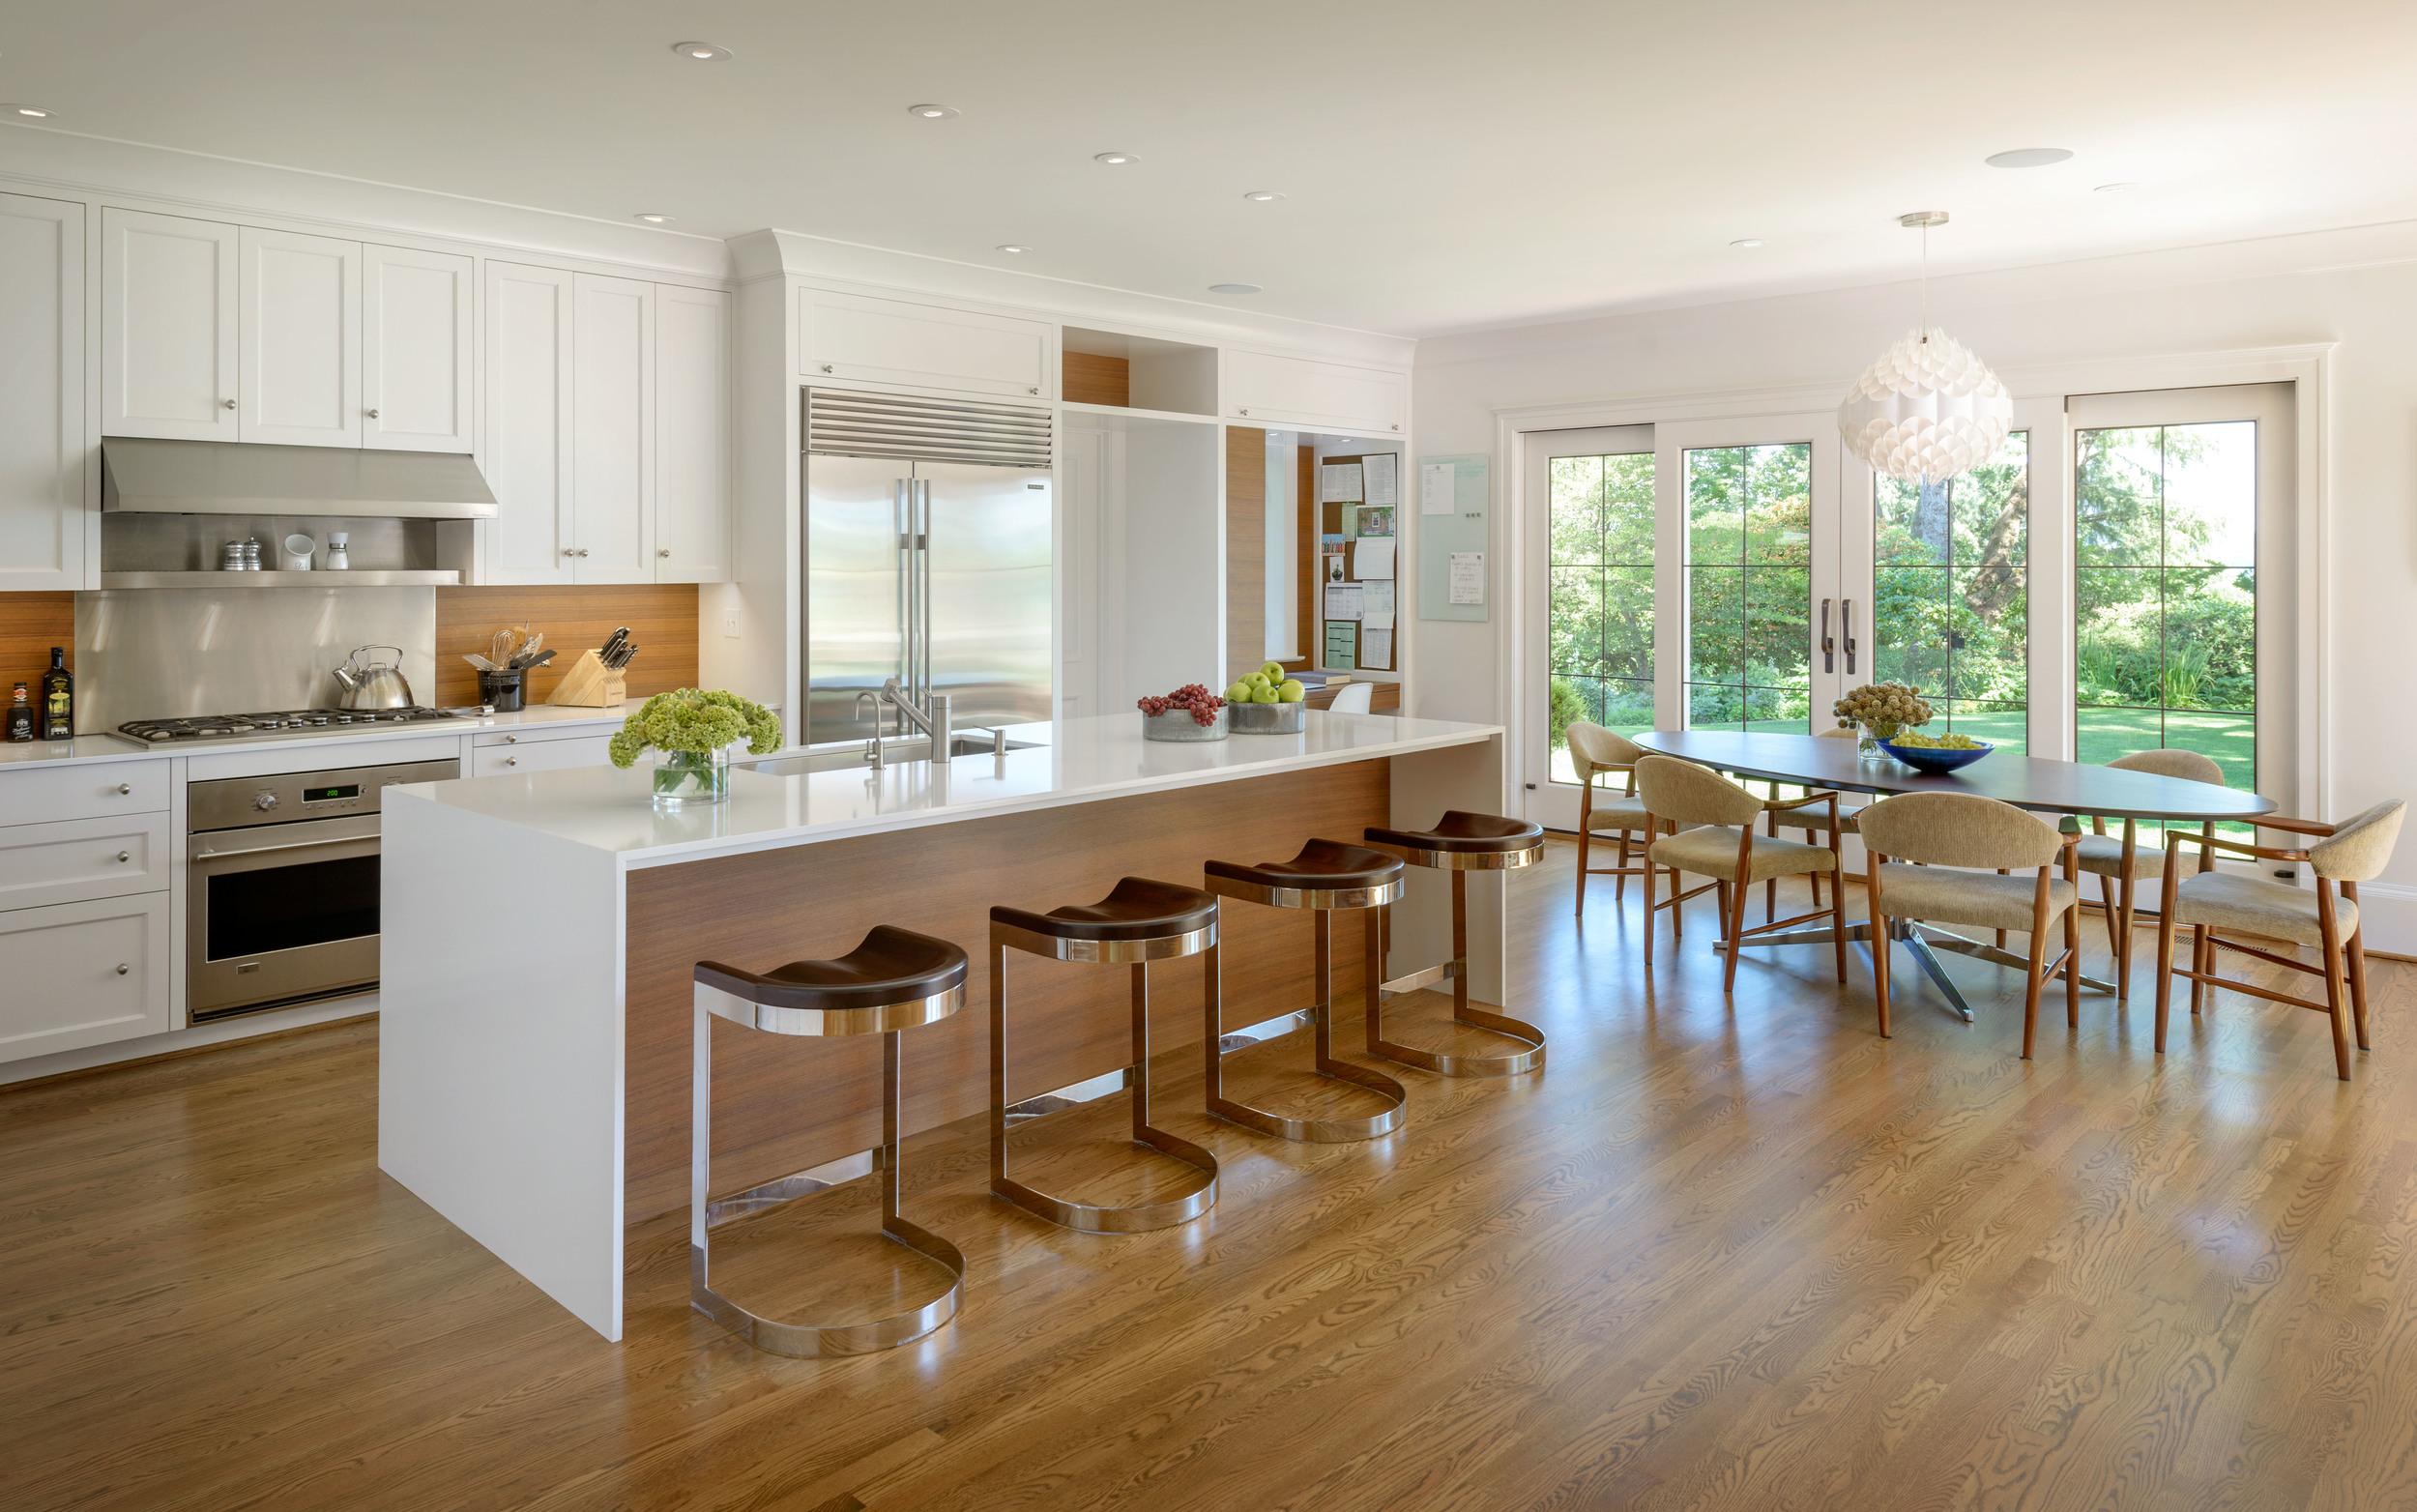 Designer: Madison Park Interiors   Architect: Conard Romano Architects   Photographer: Aaron Lietz